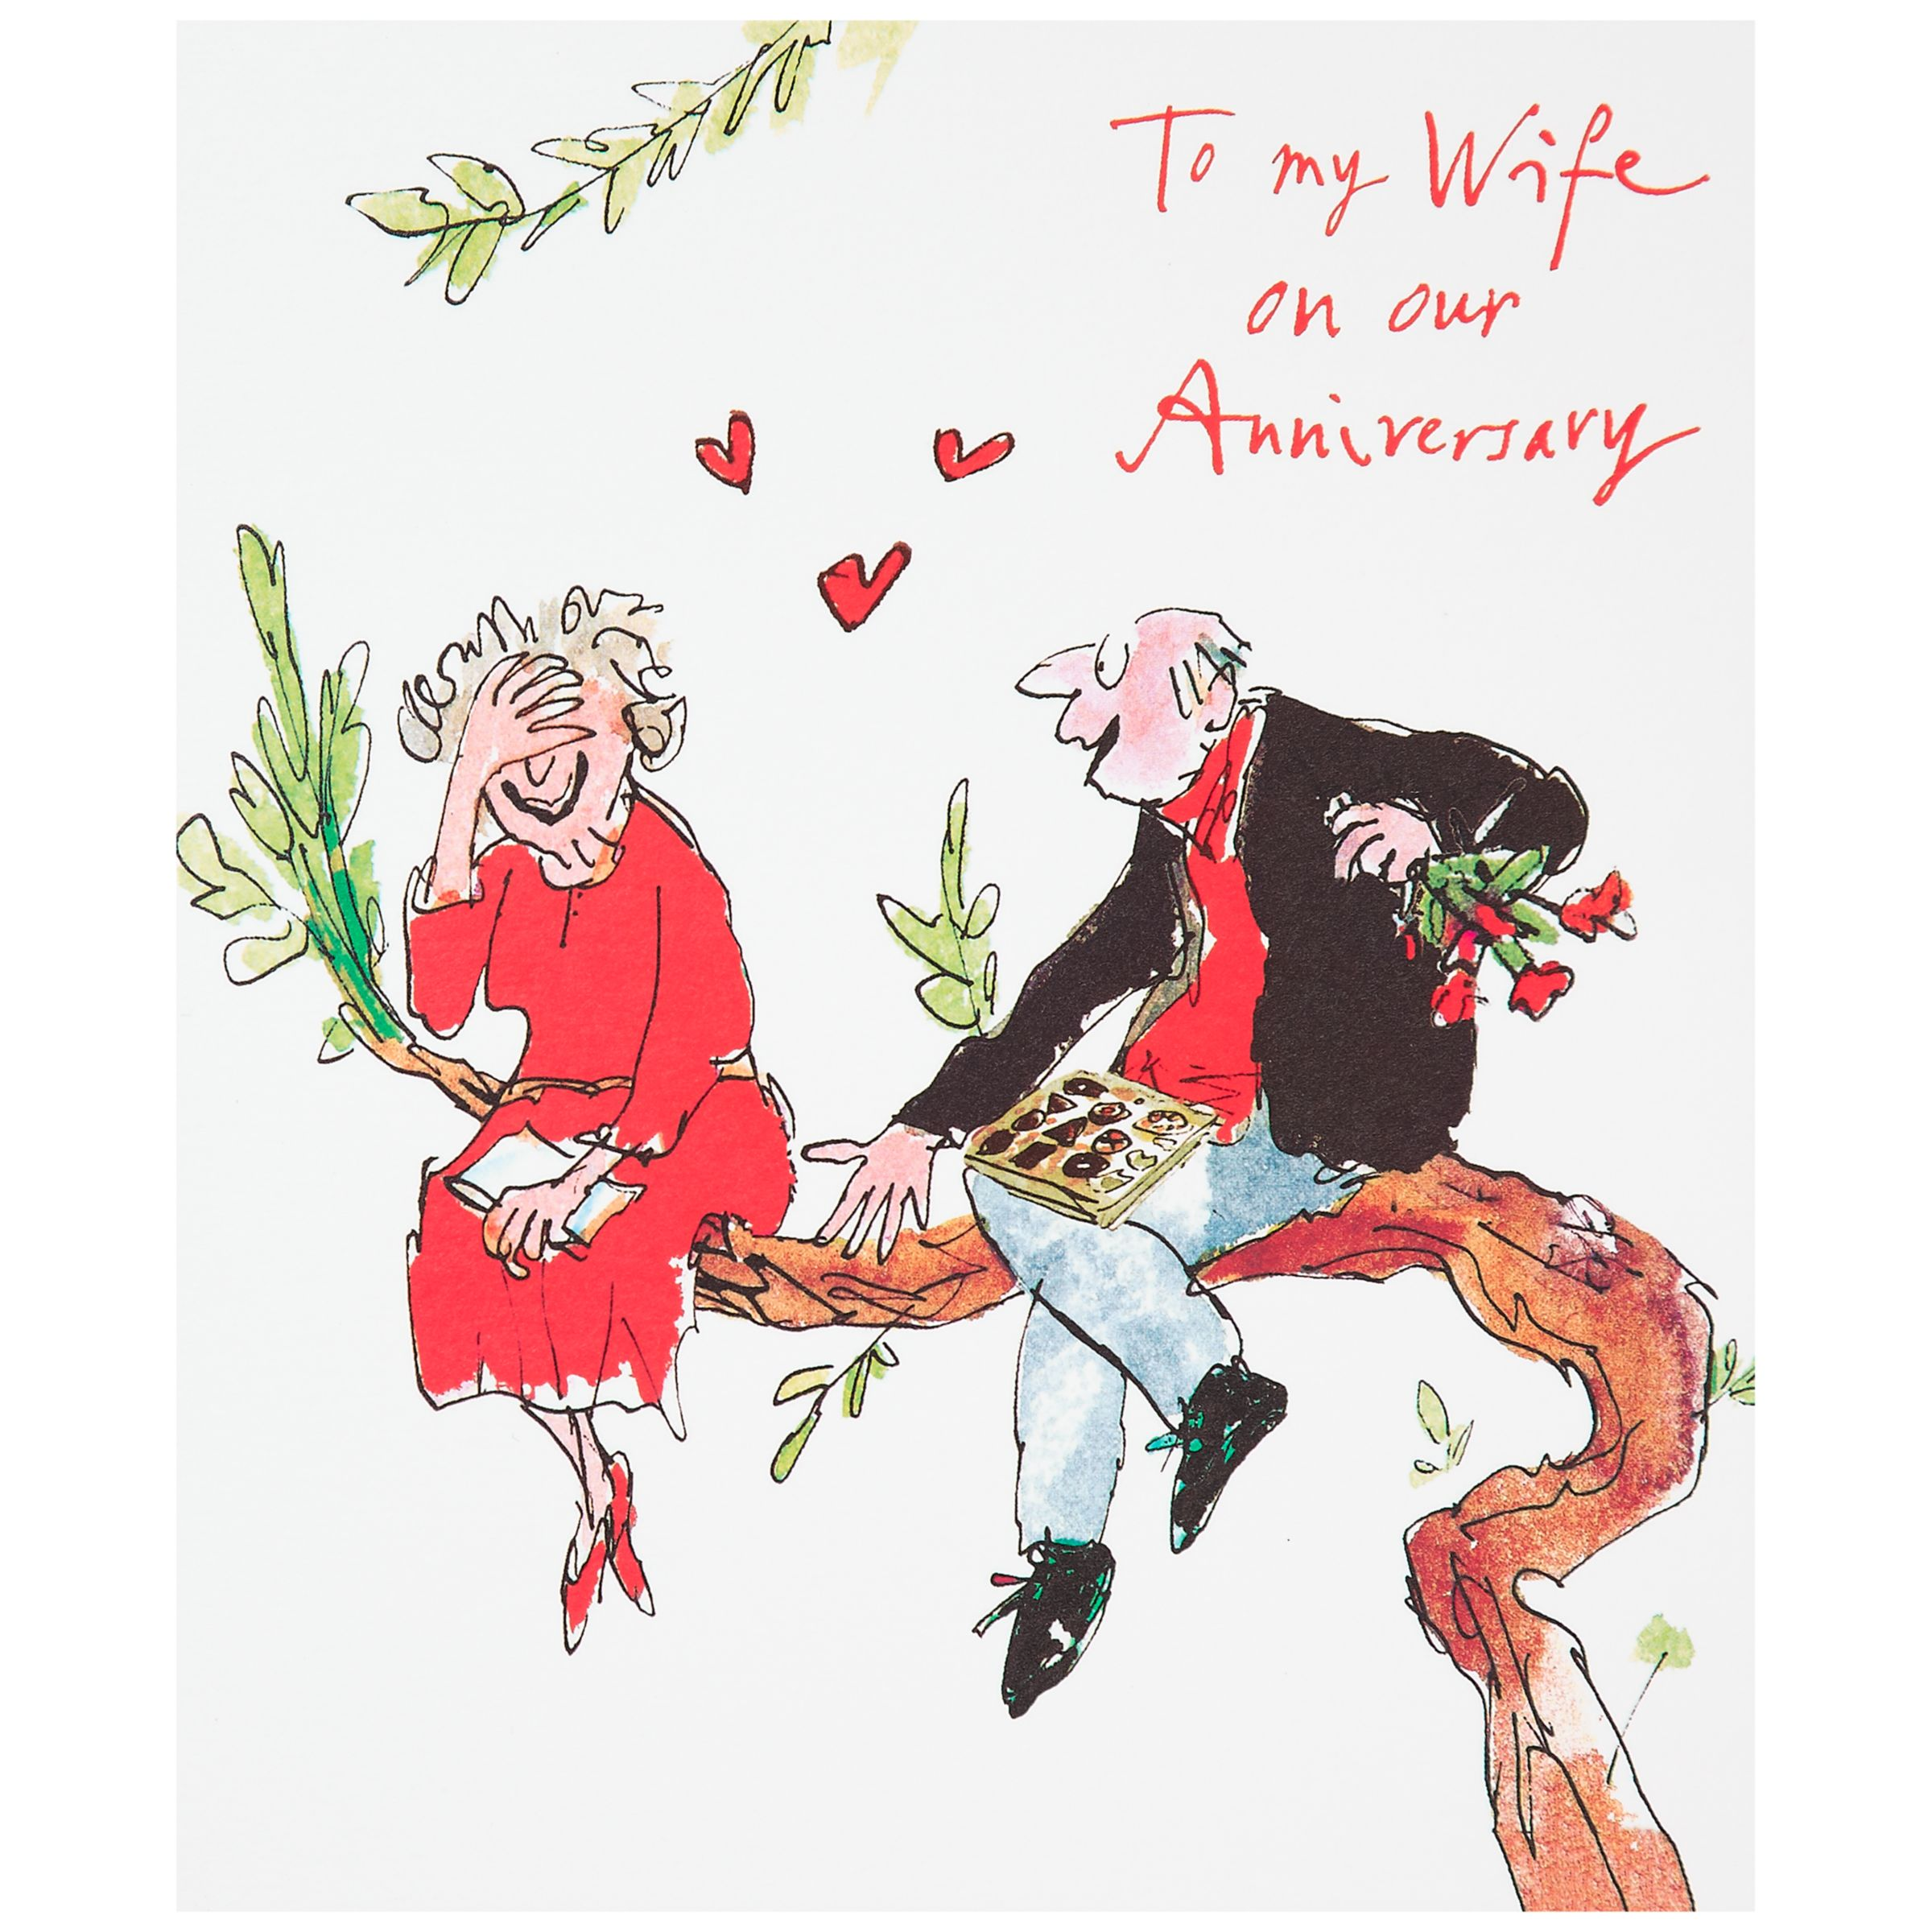 Ruby Wedding Gift Ideas John Lewis : Buy Woodmansterne Wife Anniversary Card Online at johnlewis.com